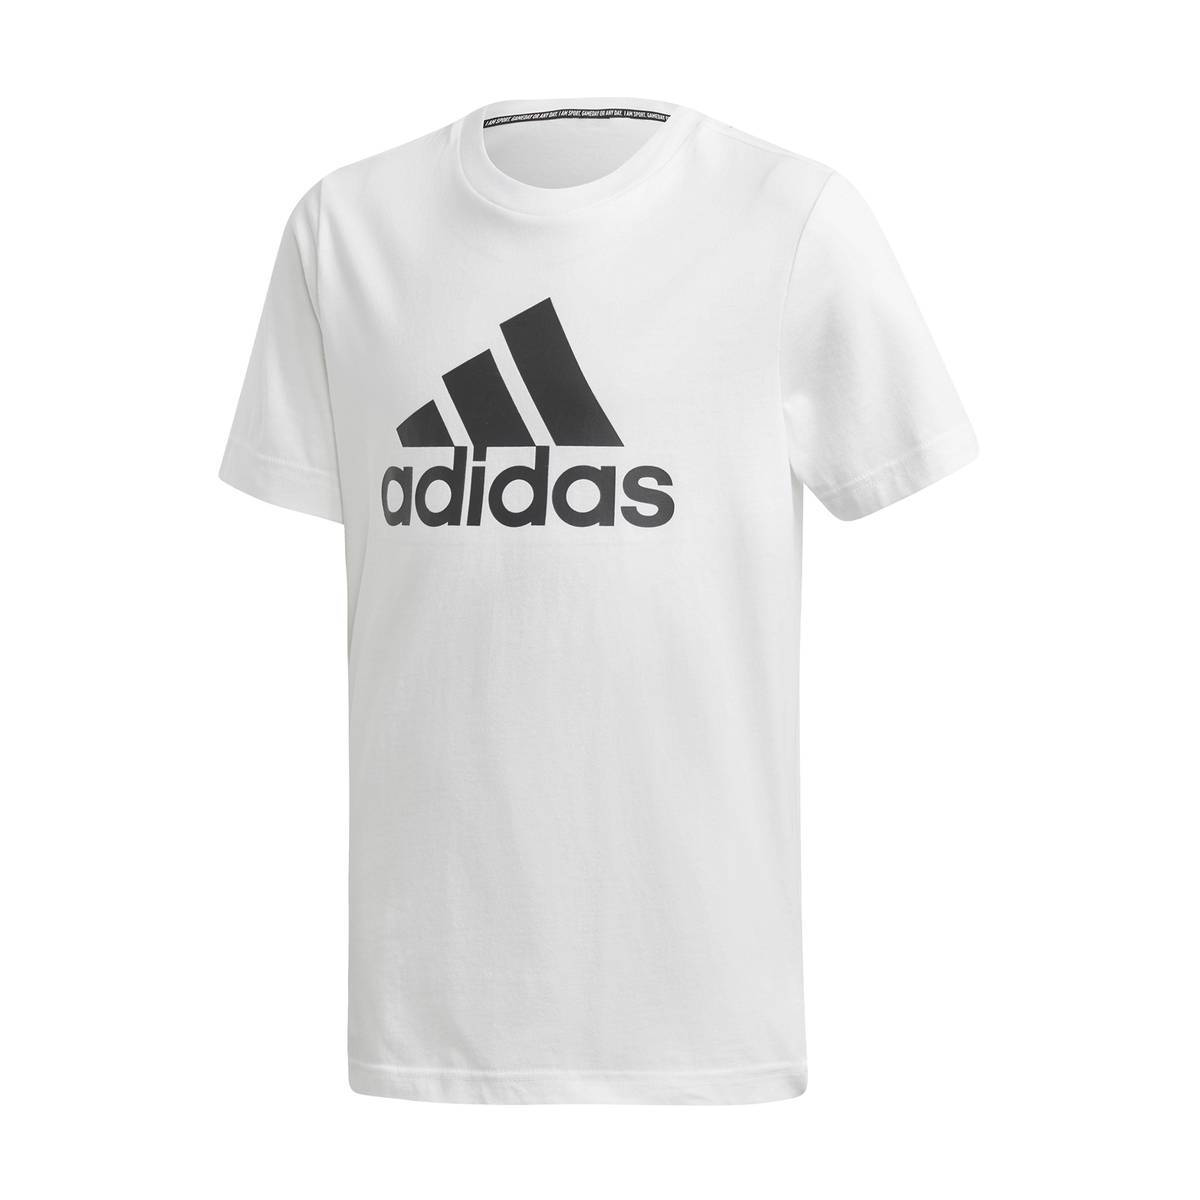 adidas Performance T-shirt 5 - 16 ans